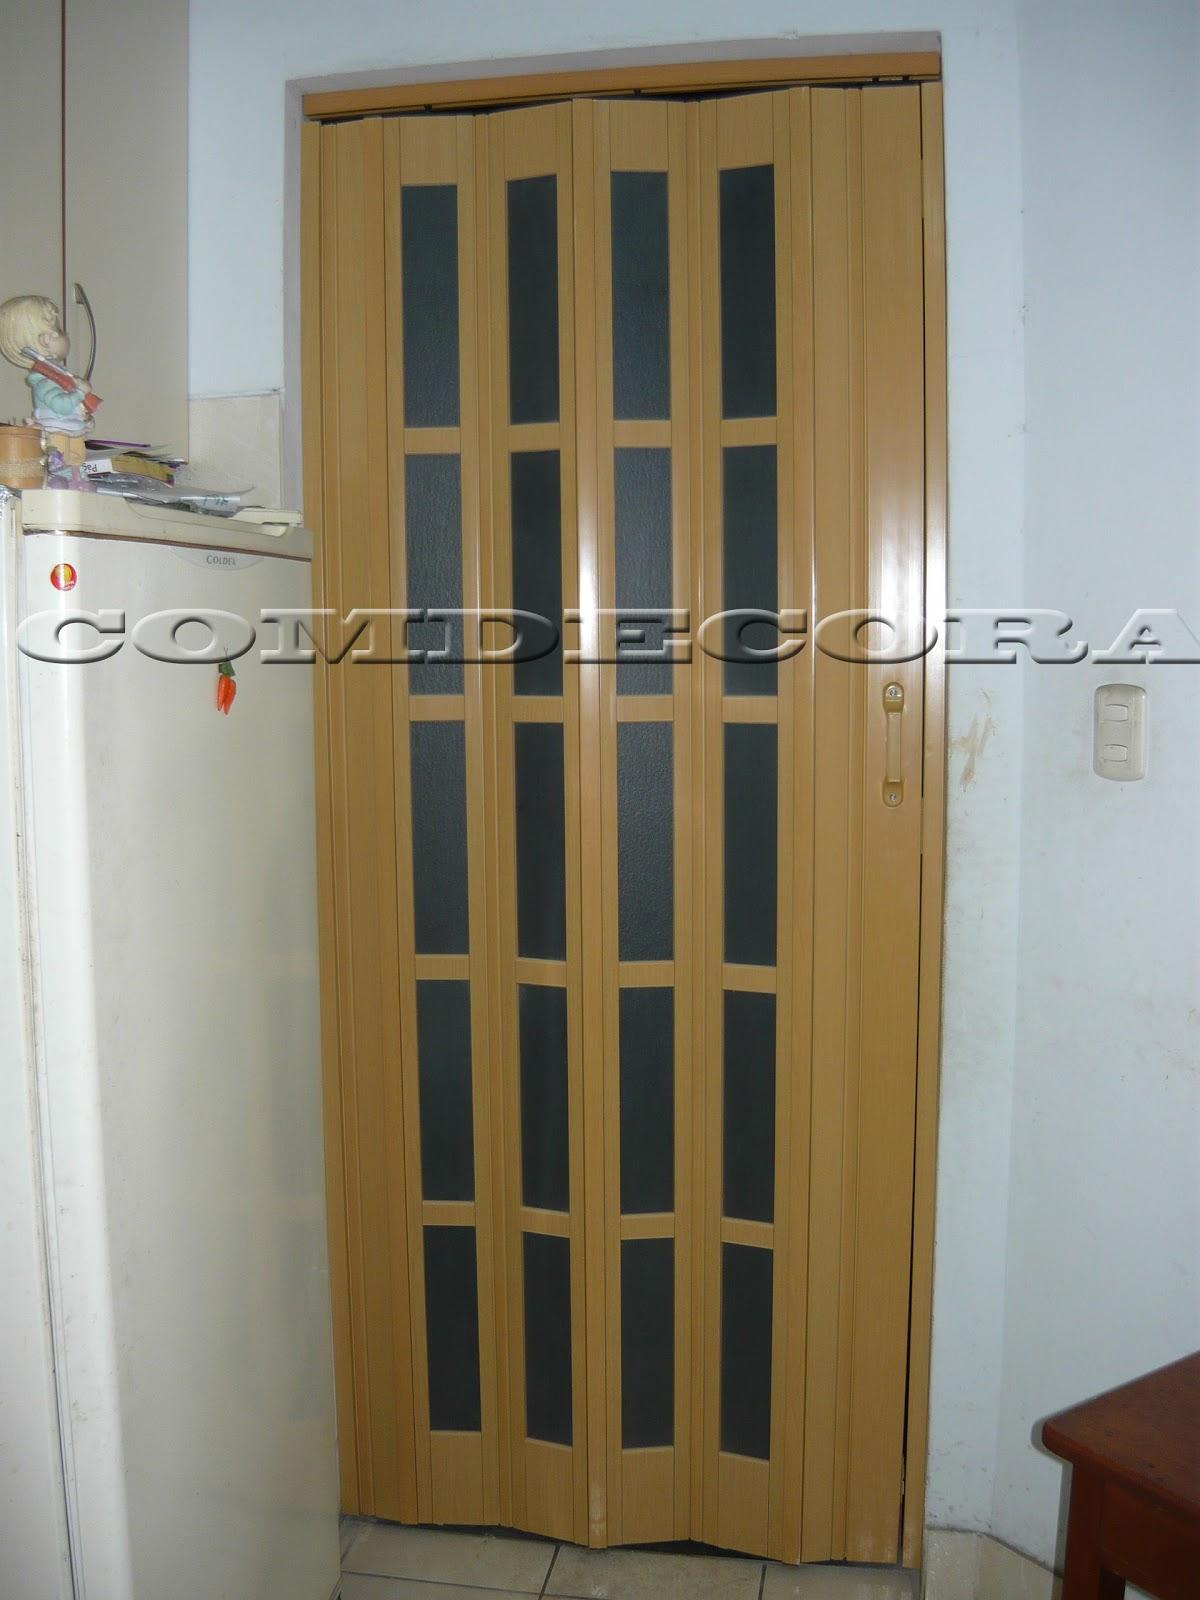 Comdecora puertas plegadizas paneles de madera dise adas for Puertas plegadizas de madera